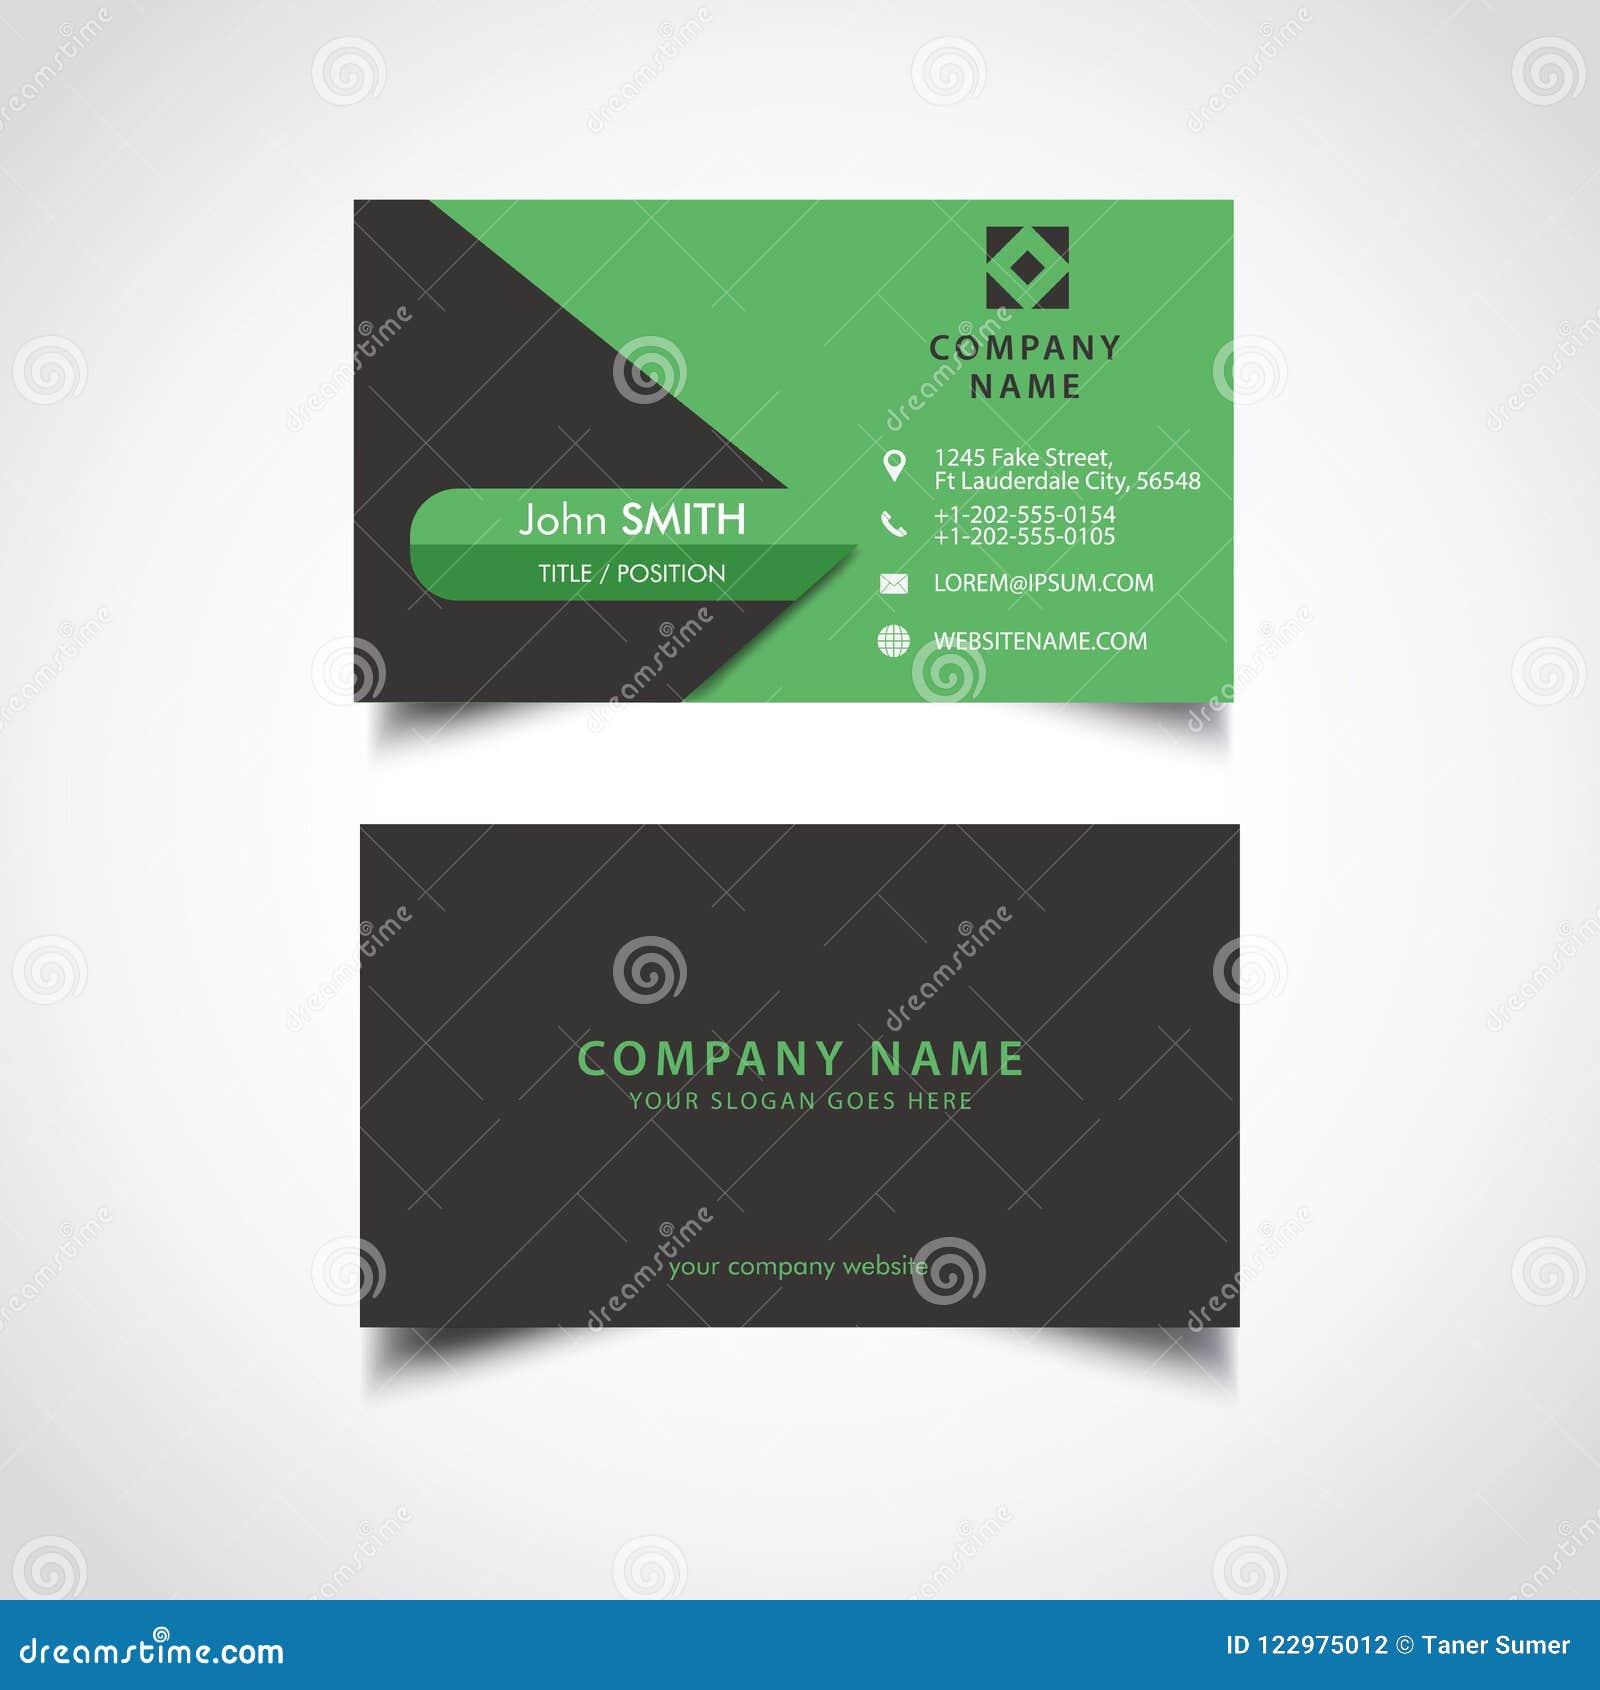 2f9e43971c50 Απλή πράσινη και σκοτεινή επαγγελματική κάρτα χρώματος Διανυσματική ...